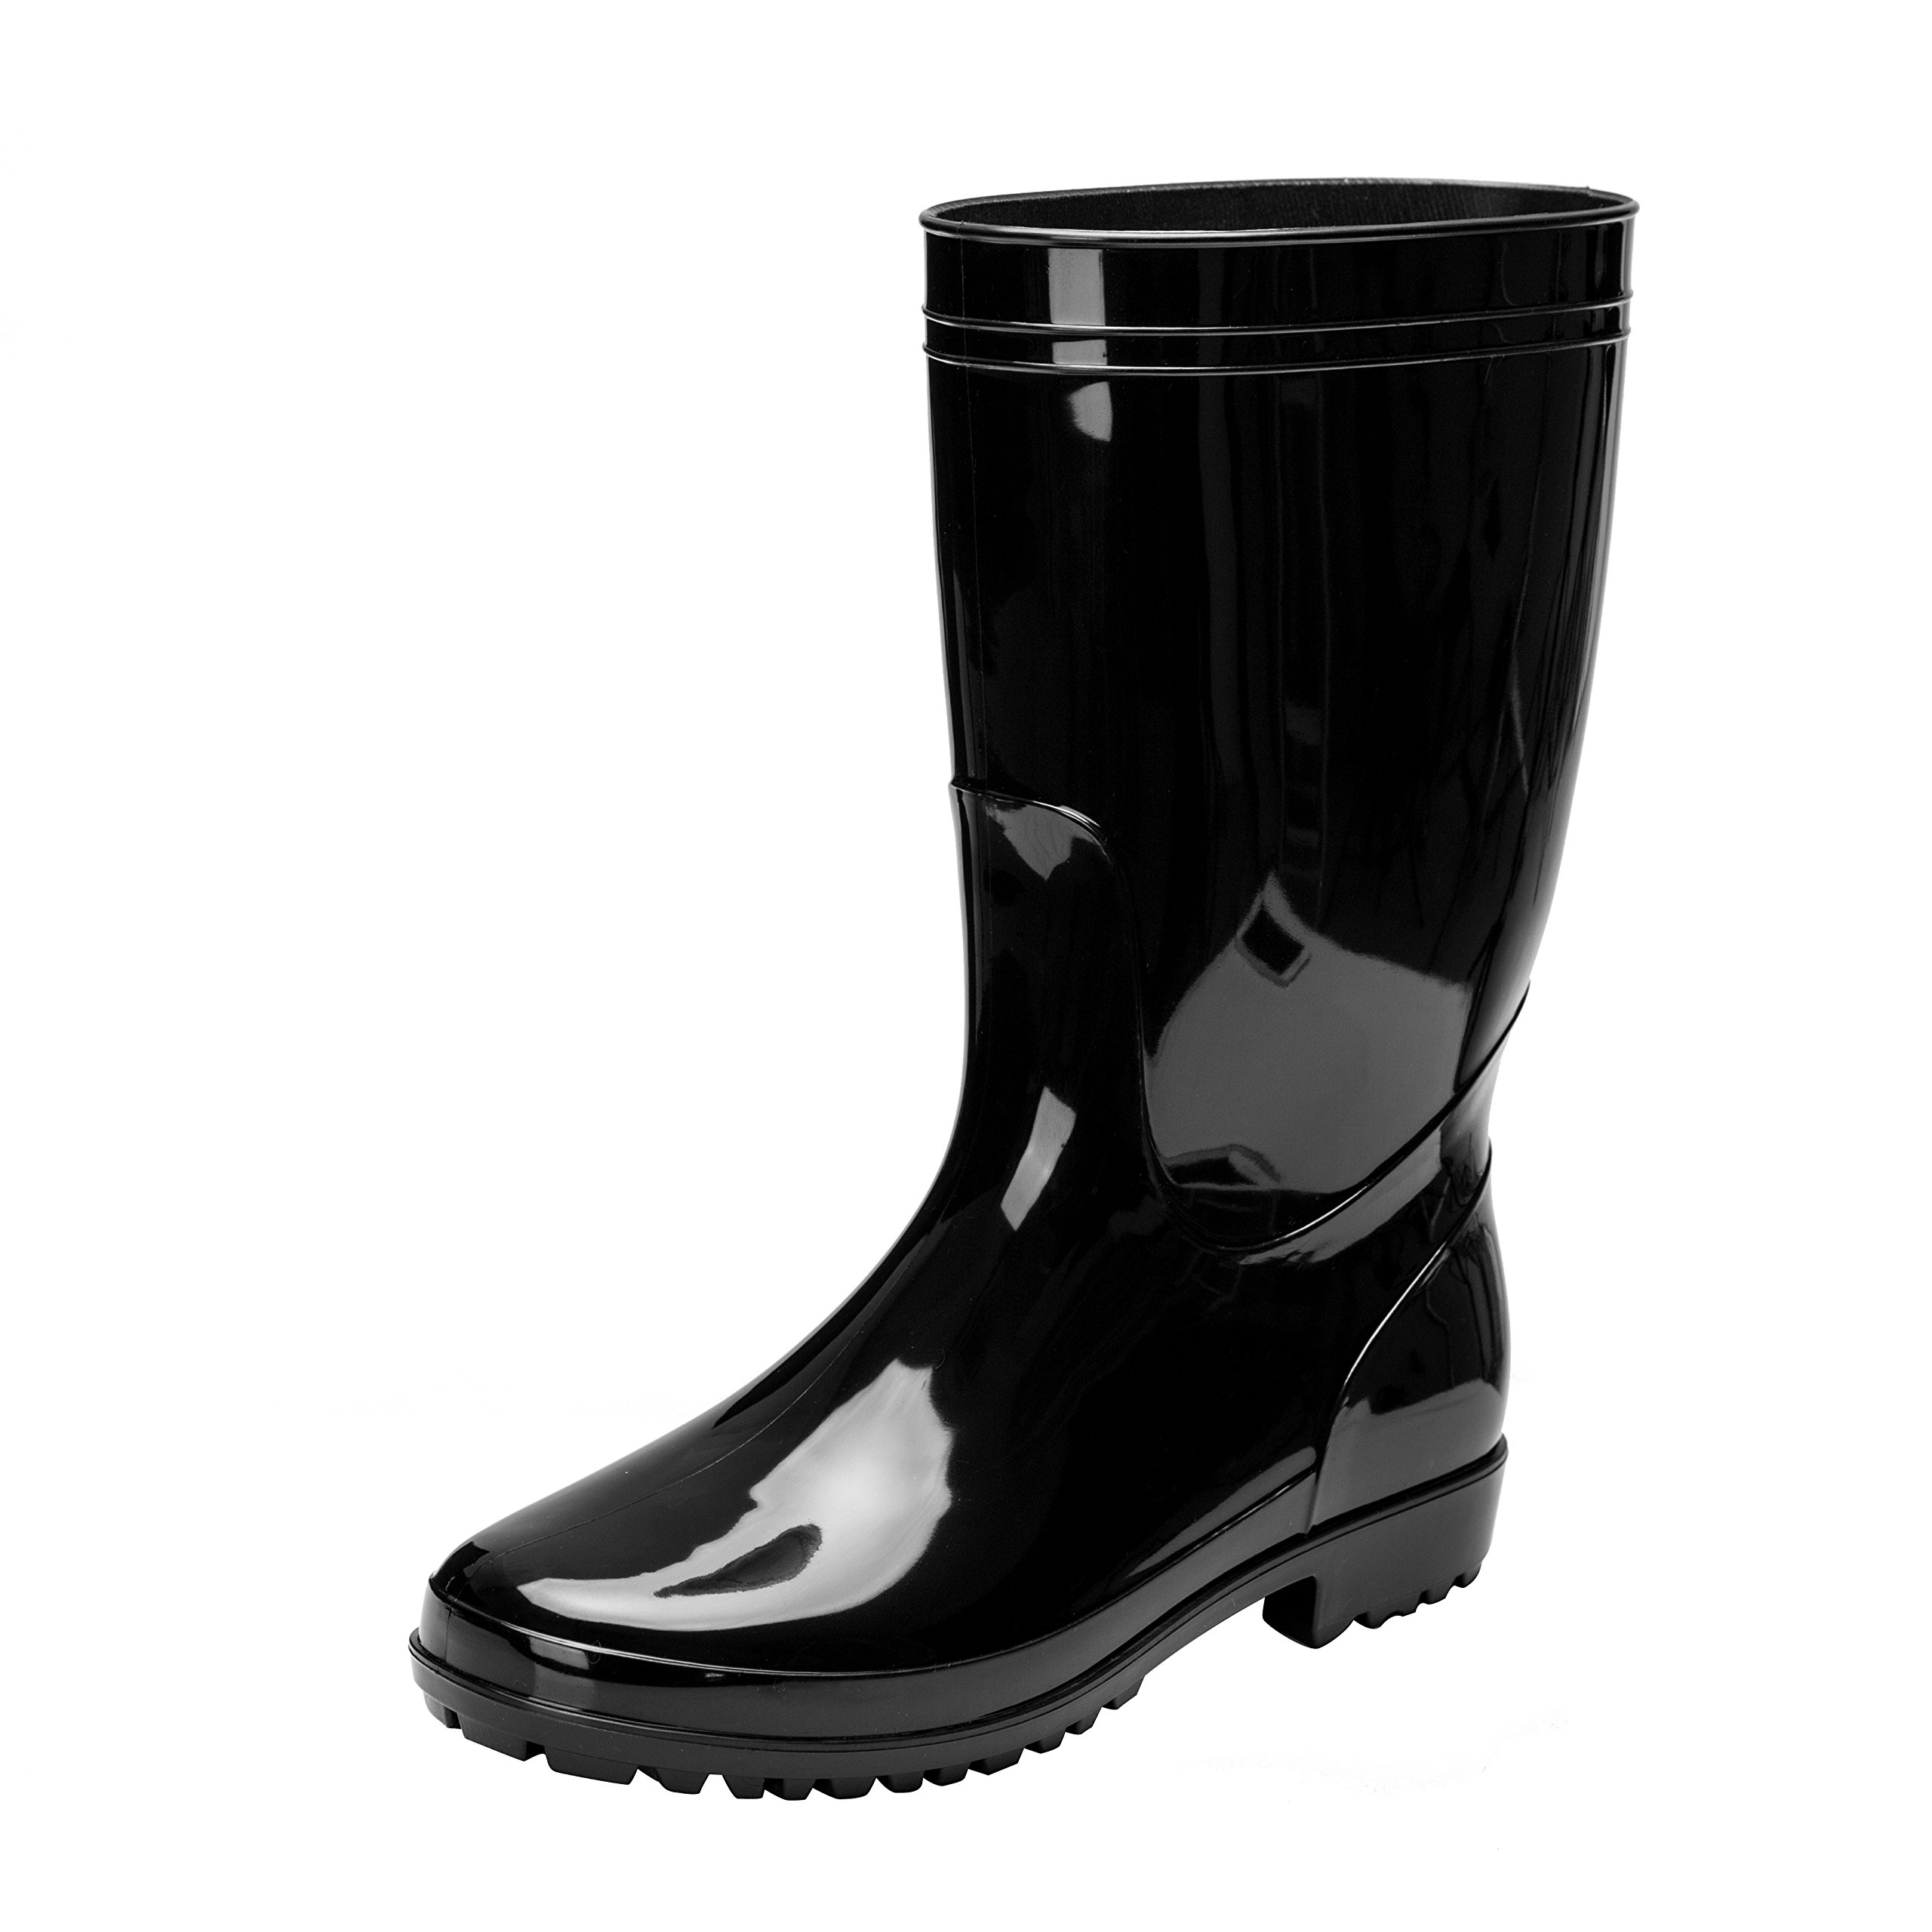 Comwarm Men Waterproof Snow Rain Boots Anti-Slip PVC Black Adult Outdoor Work Rain Shoes, Size 10.5